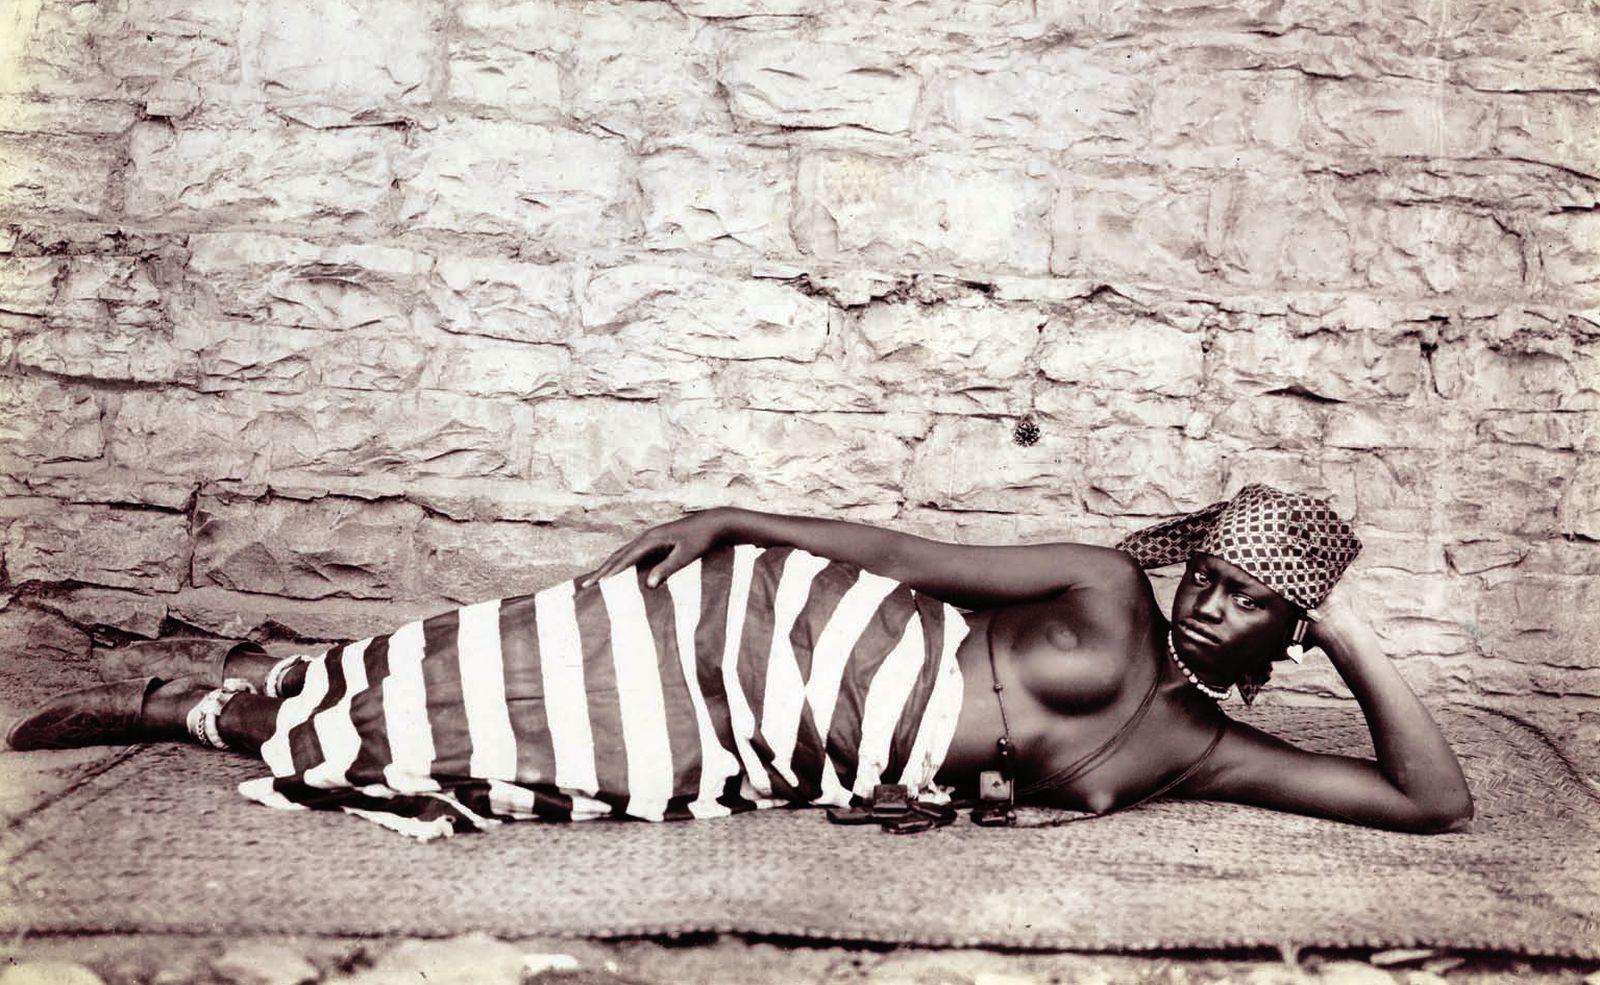 Photographe anonyme. Kayes, Soudan français (Mali) vers 1890. Vialumieredesroses